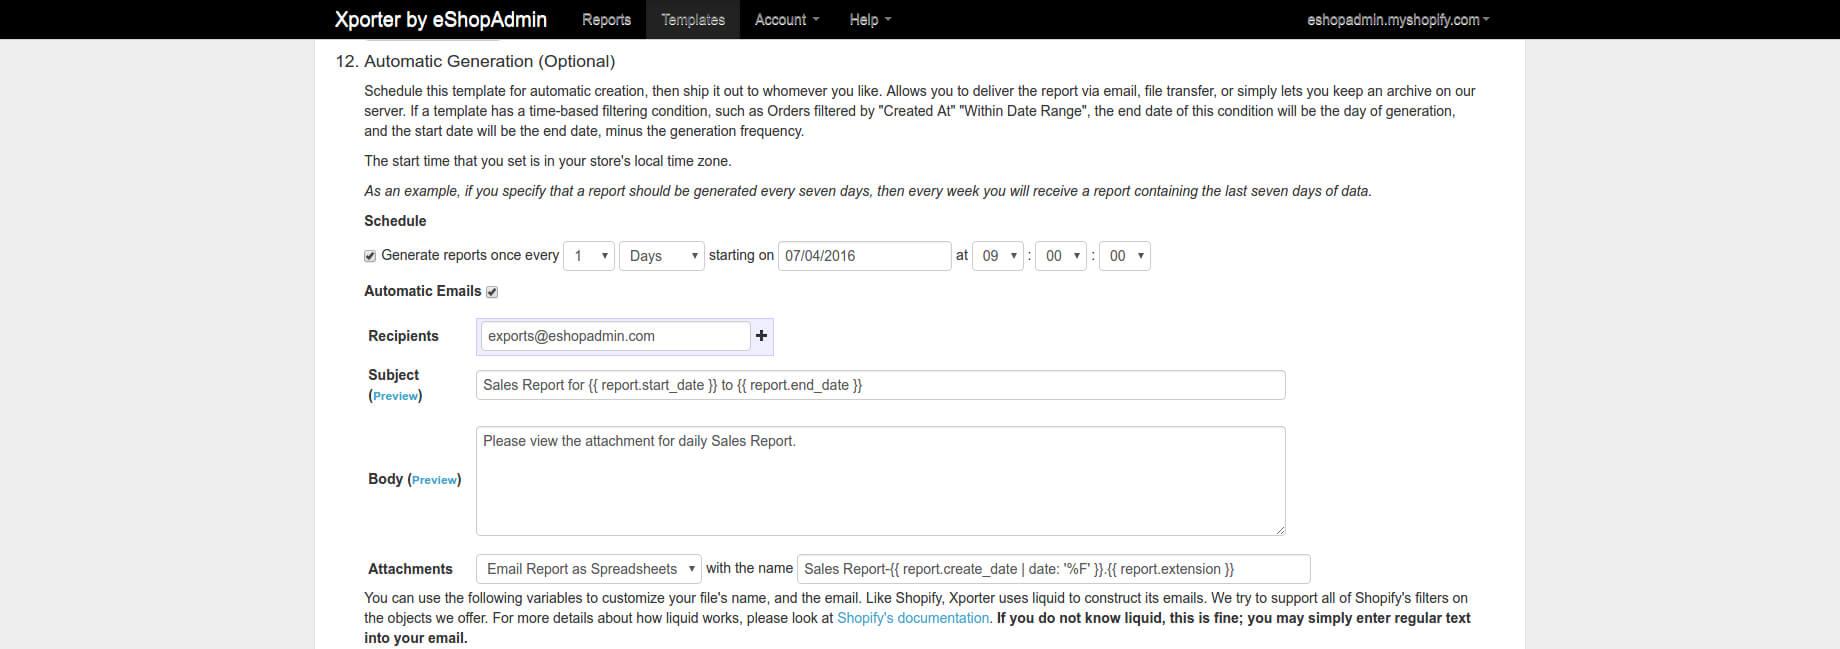 100+ [ Customer Visit Report Template Free Download ] | It In Customer Visit Report Template Free Download